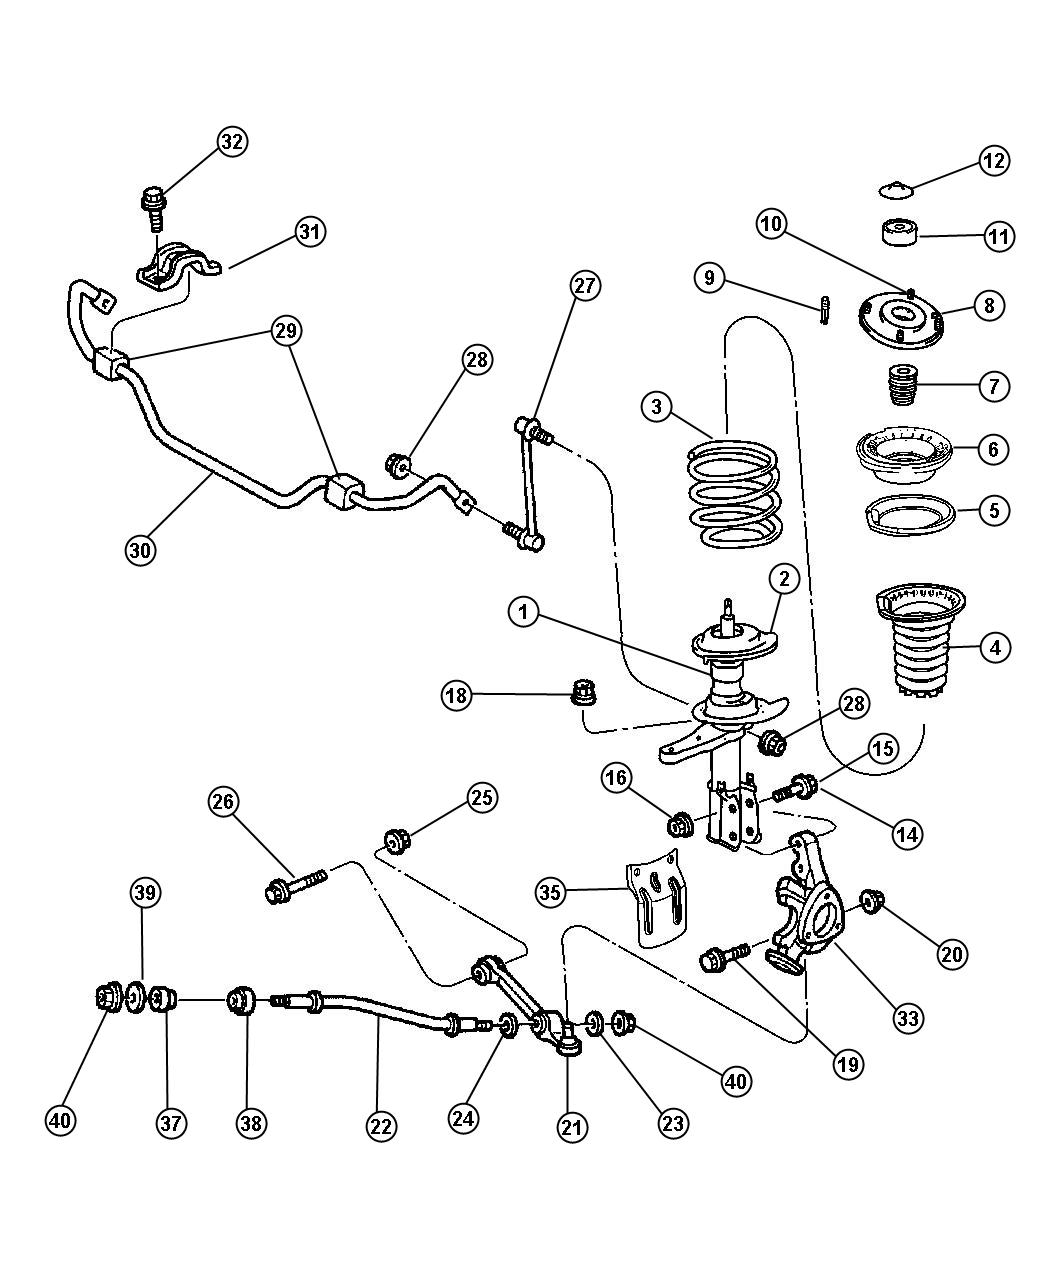 Chrysler 300 Nut Mounting Upper Upper Control Arm Hex